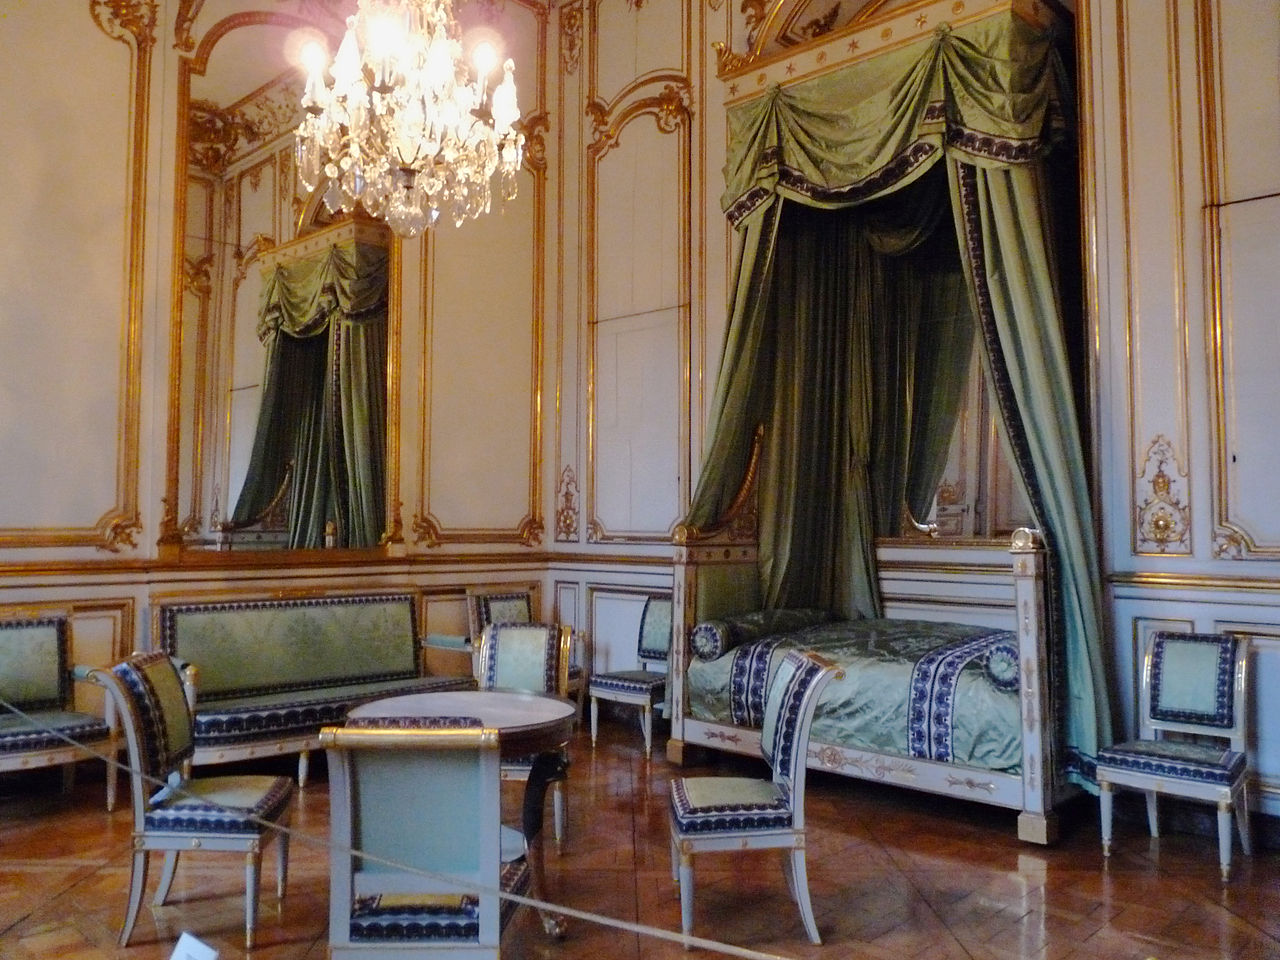 fichier chambre coucher de napol on ier palais rohan strasbourg 1 jpg wikip dia. Black Bedroom Furniture Sets. Home Design Ideas